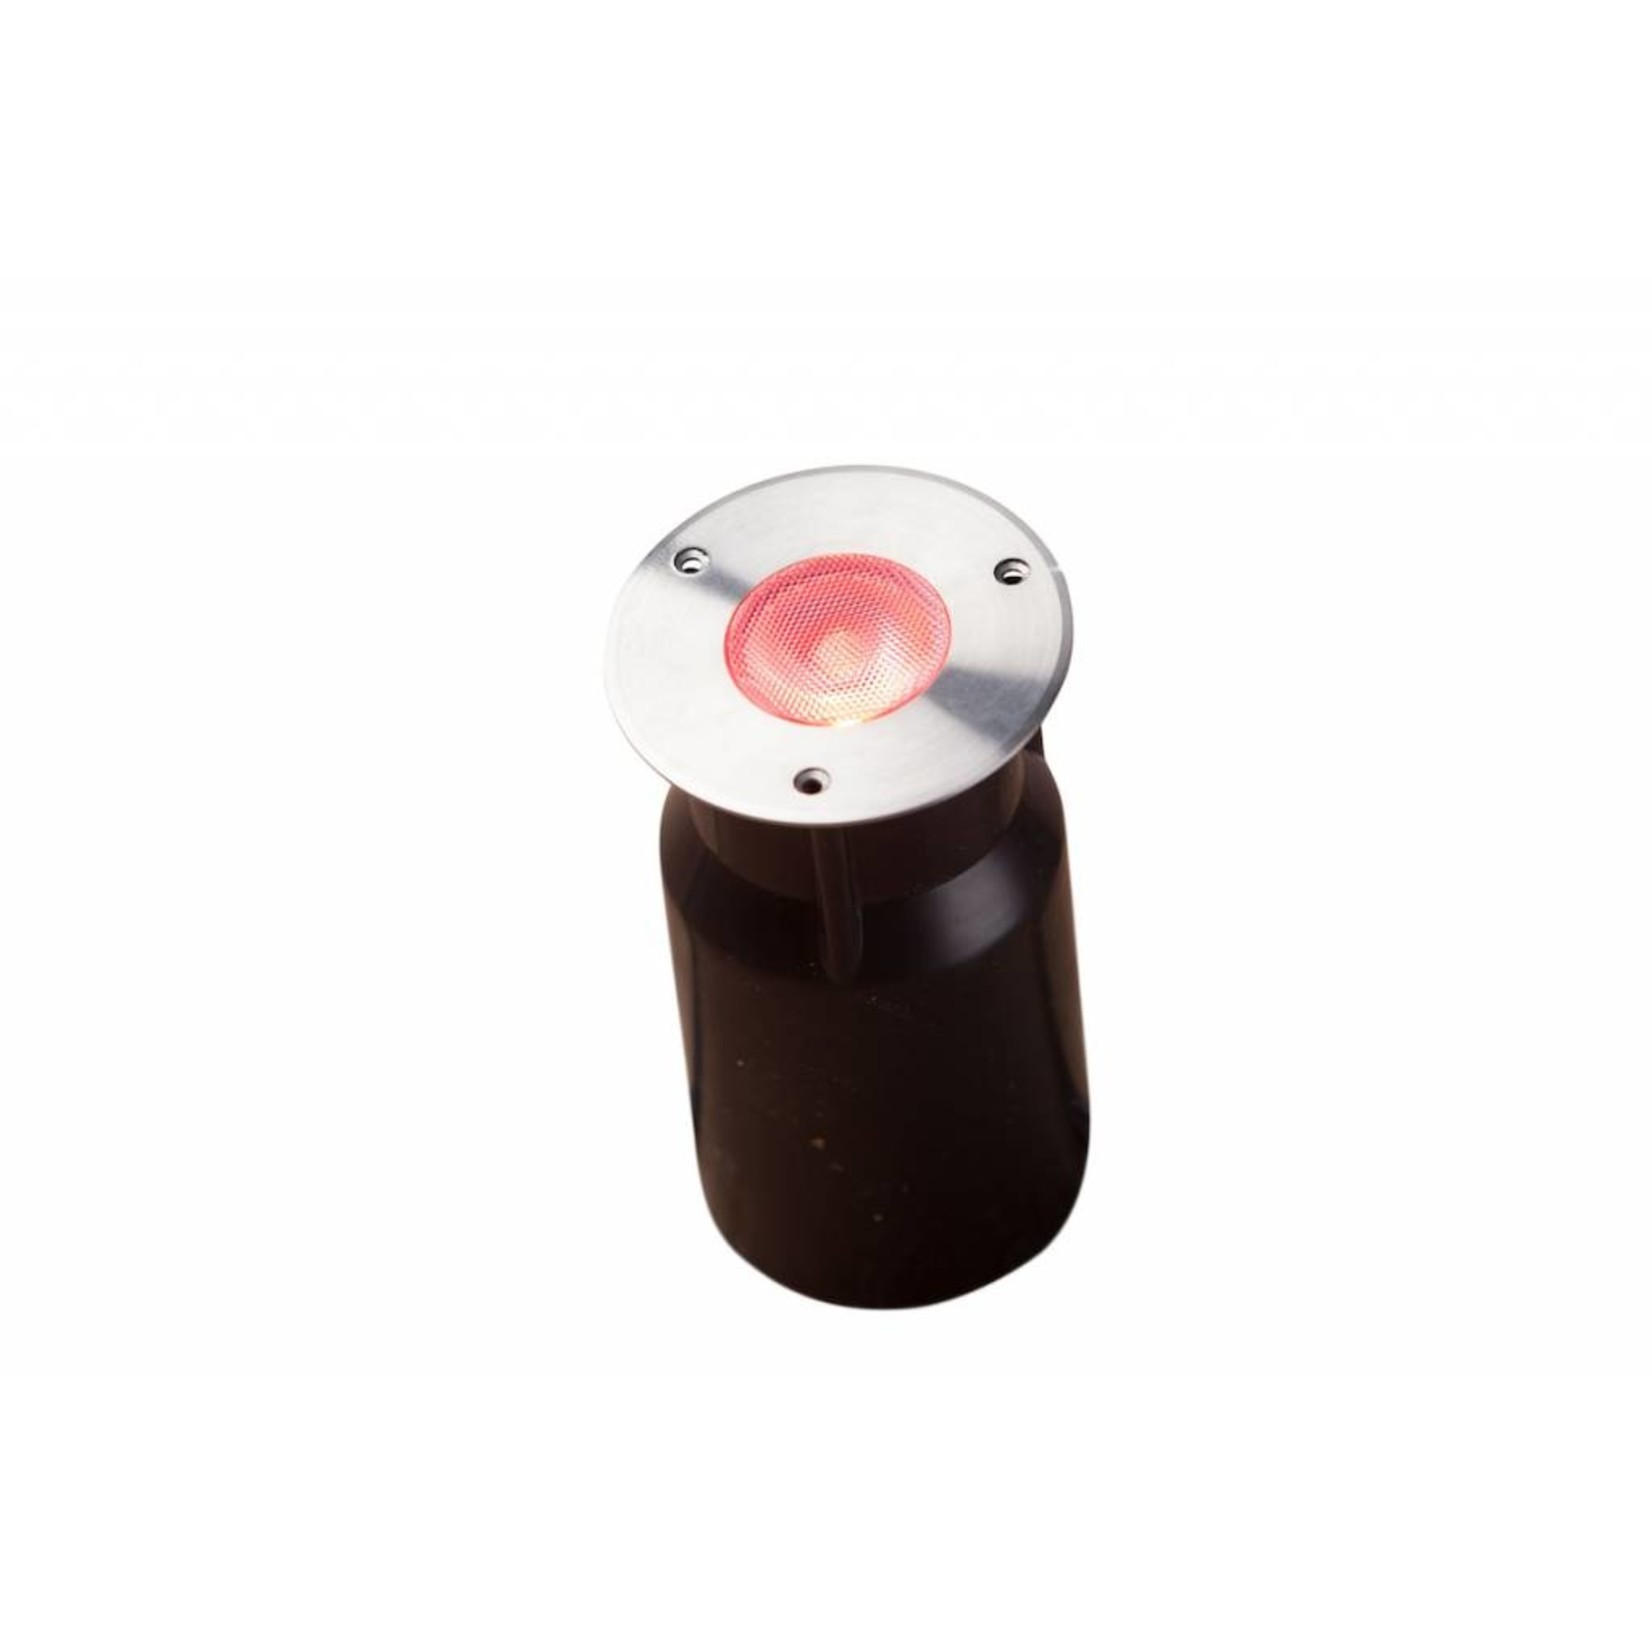 Smart Light vlonderverlichting 3W RGB RVS